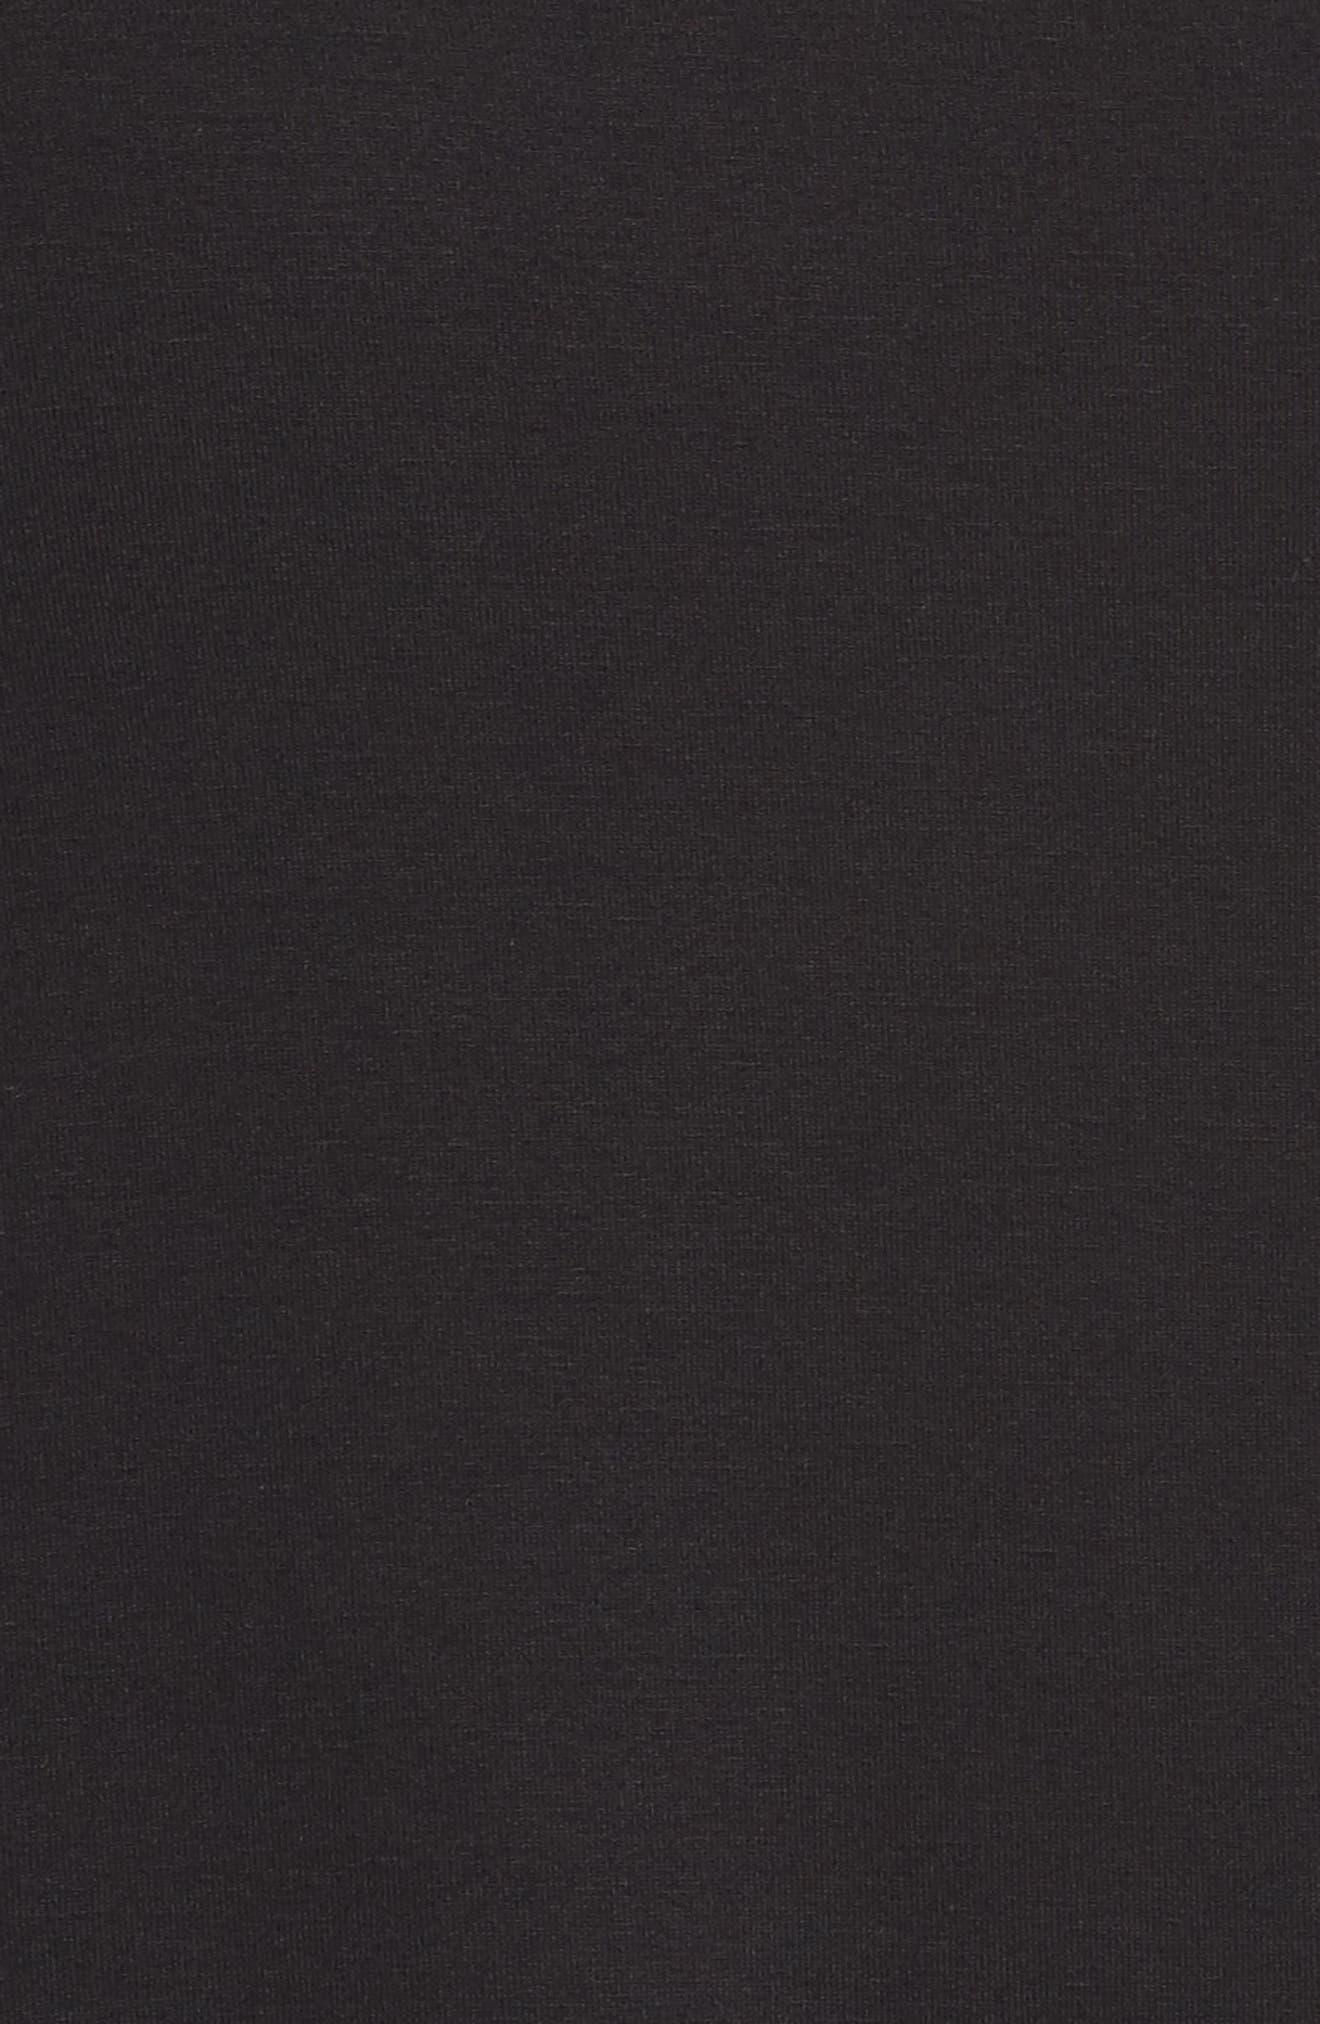 Turtleneck Jersey Top,                             Alternate thumbnail 5, color,                             Black